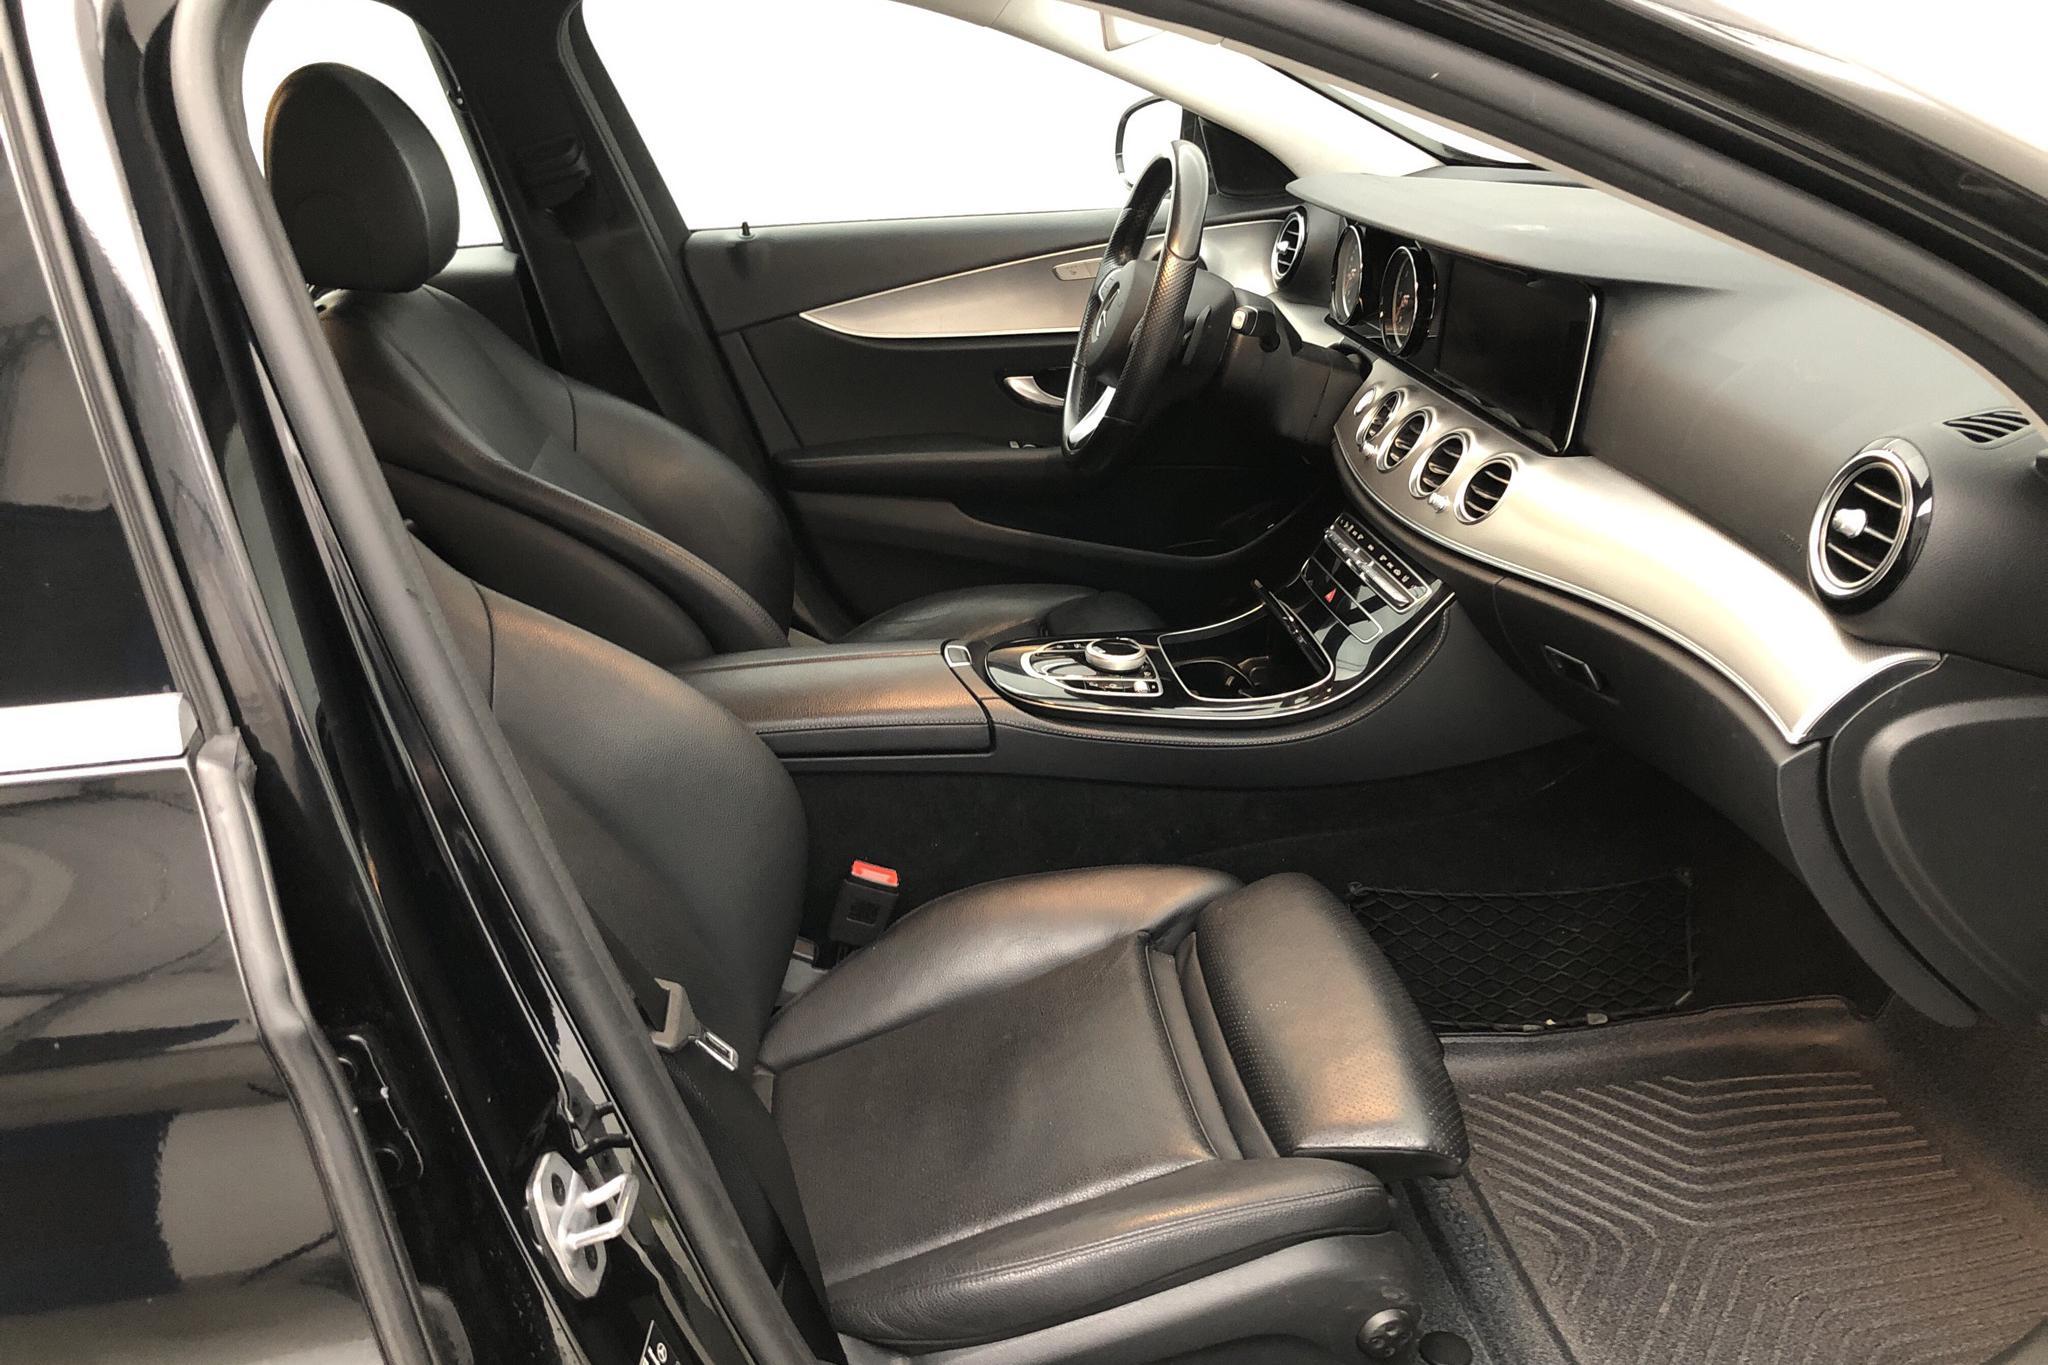 Mercedes E 220 d Kombi S213 (194hk) - 19 964 mil - Automat - svart - 2018